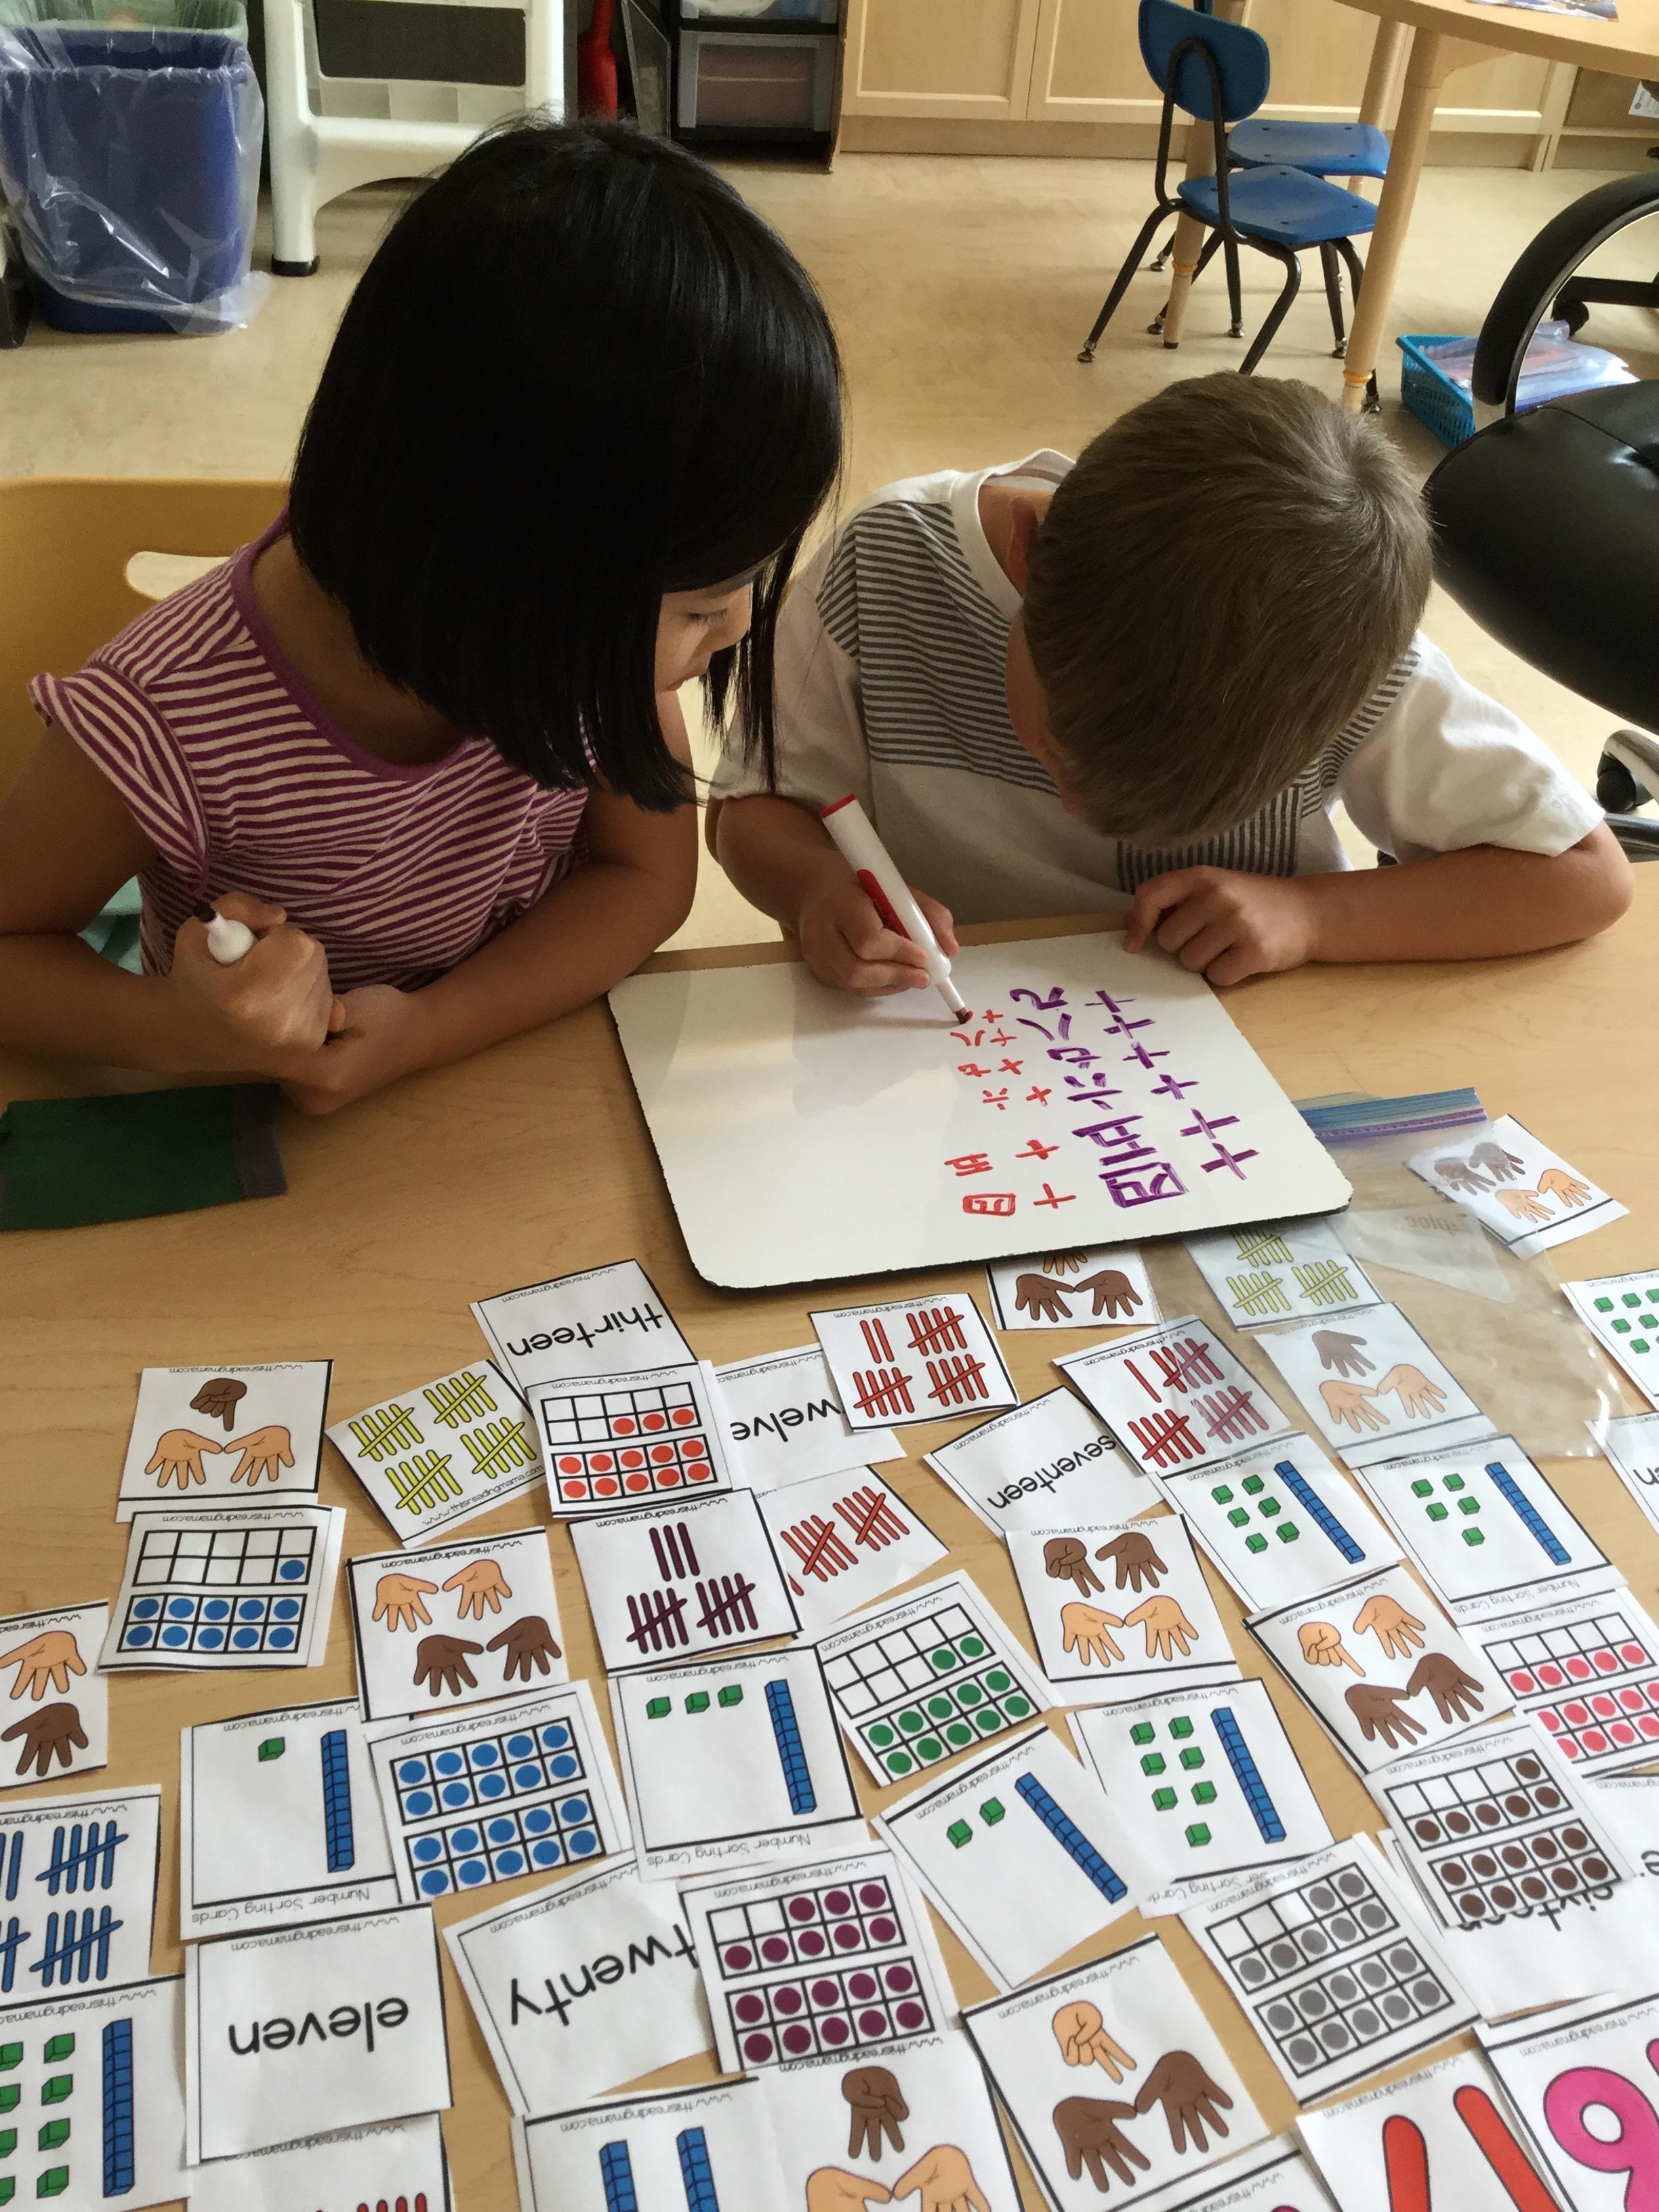 First graders hard at work.